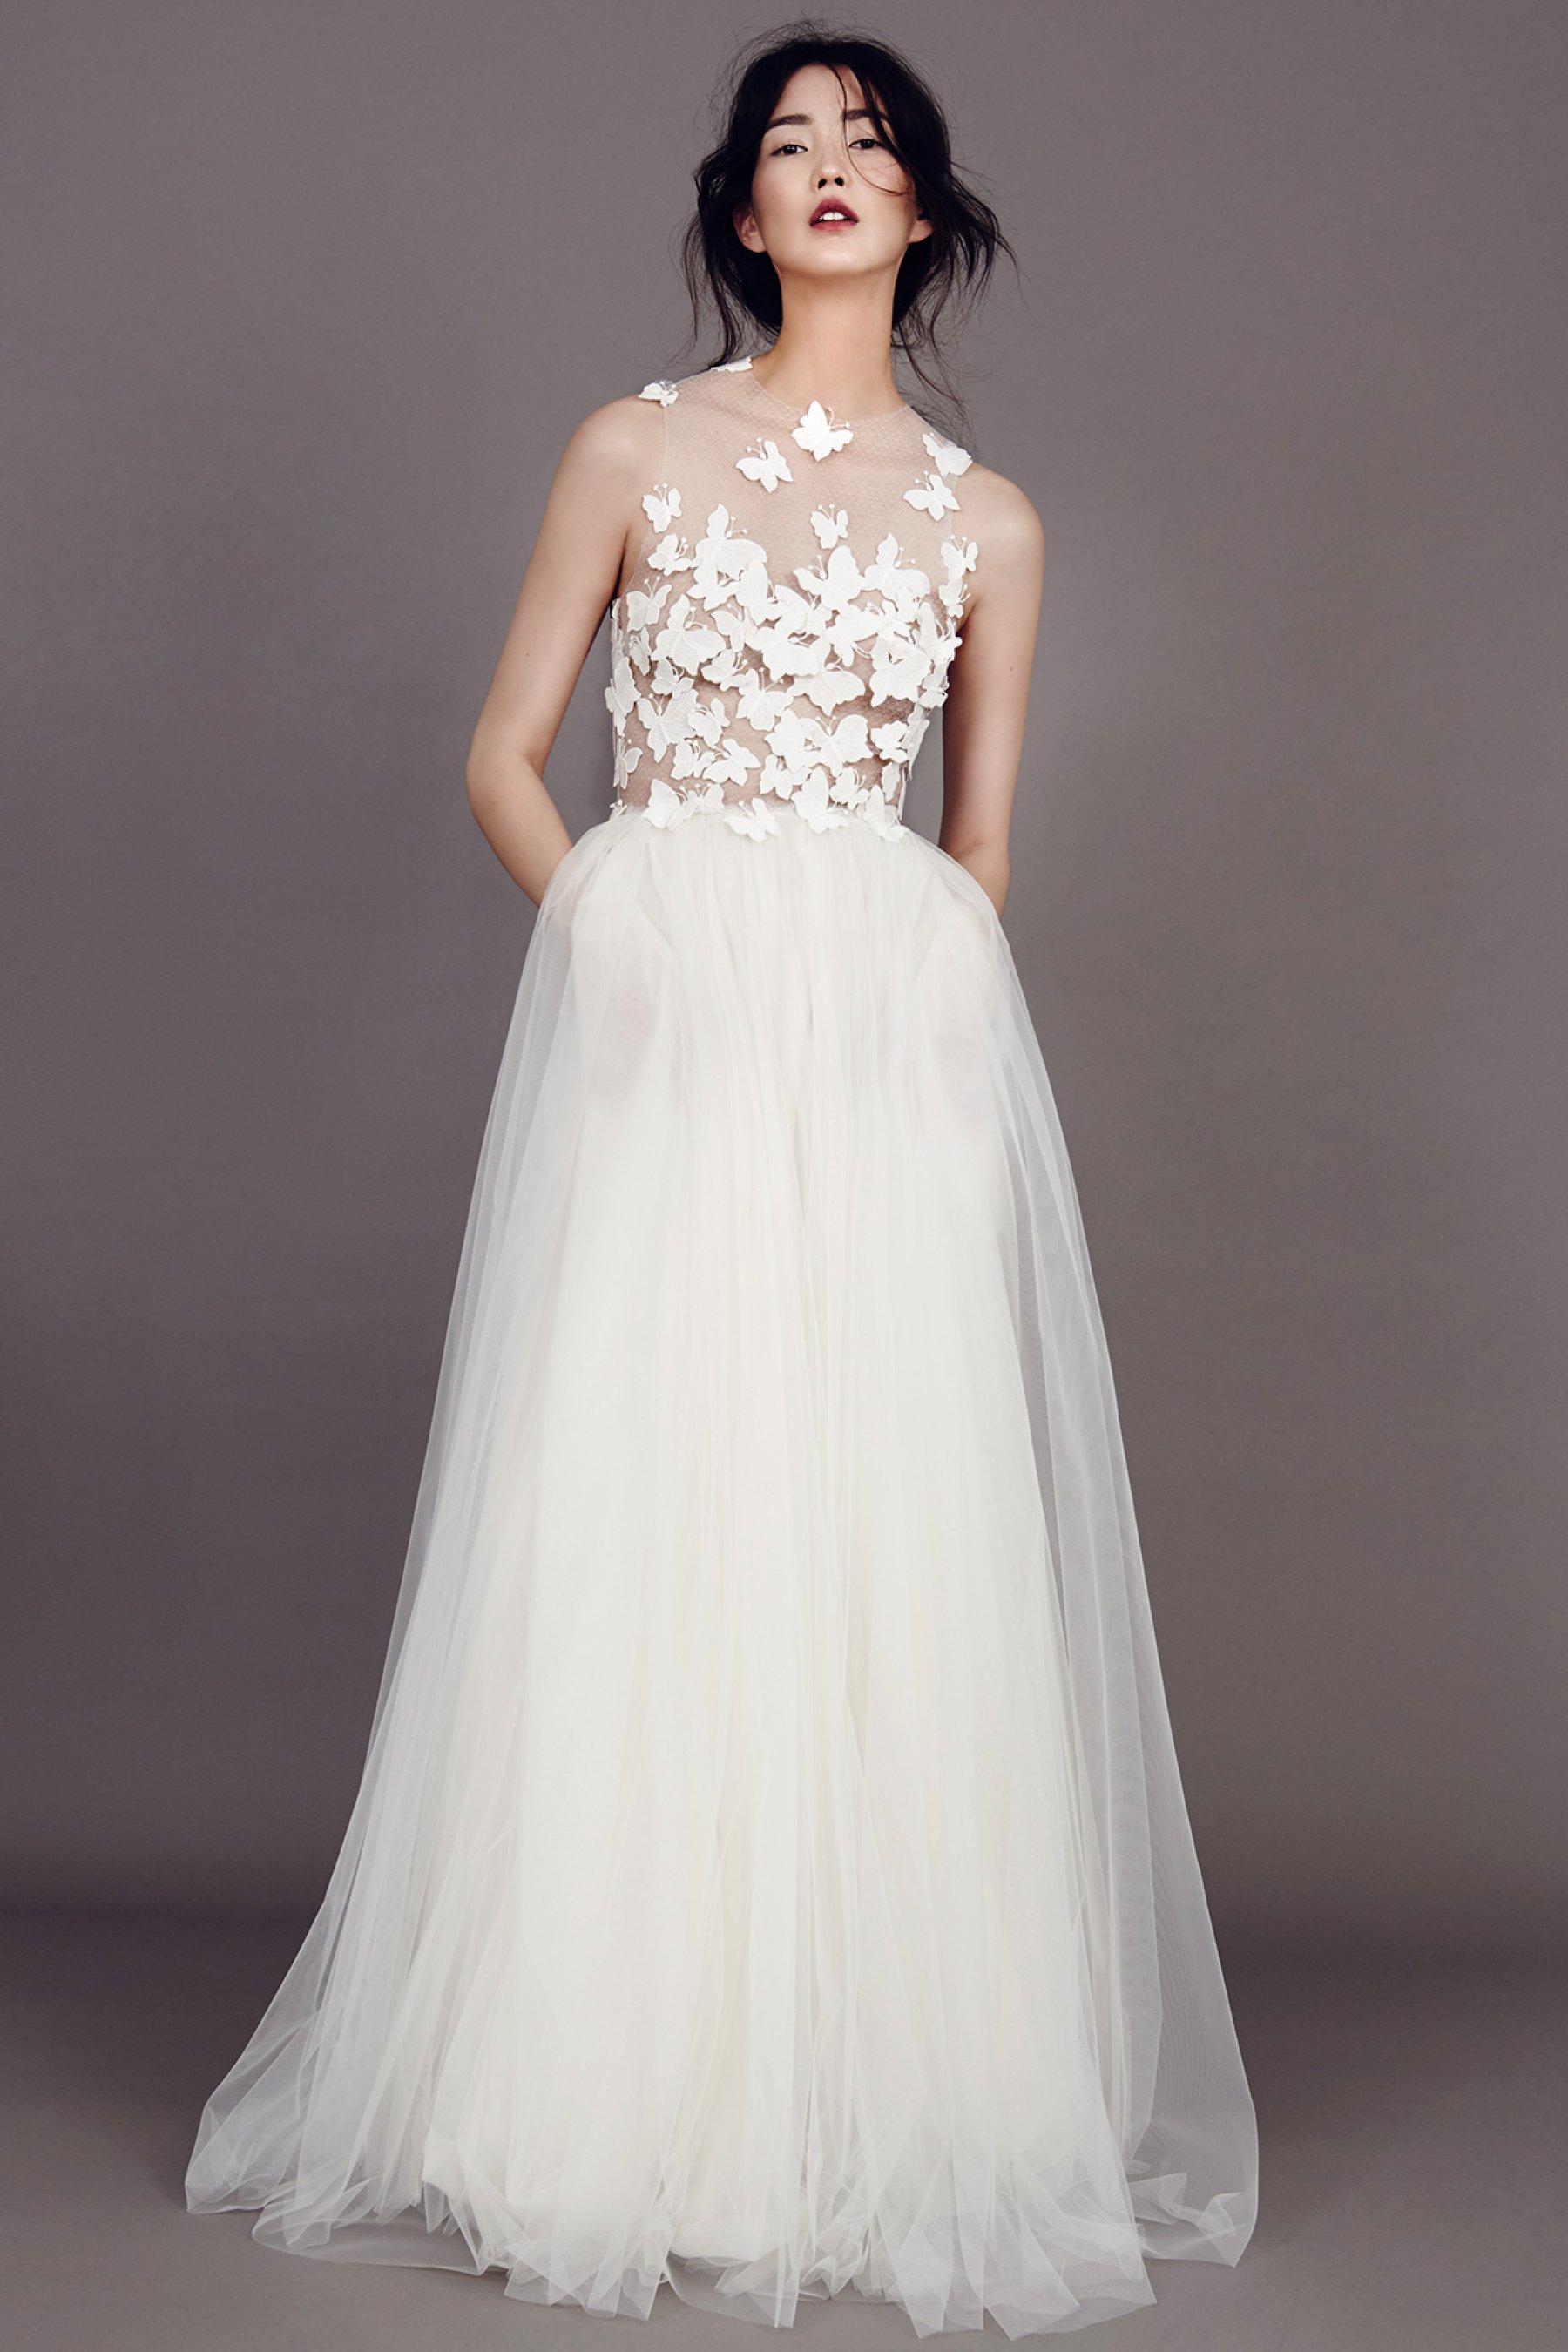 kaviargauche-bridalcouture-2015-papillondamourdress3.jpg